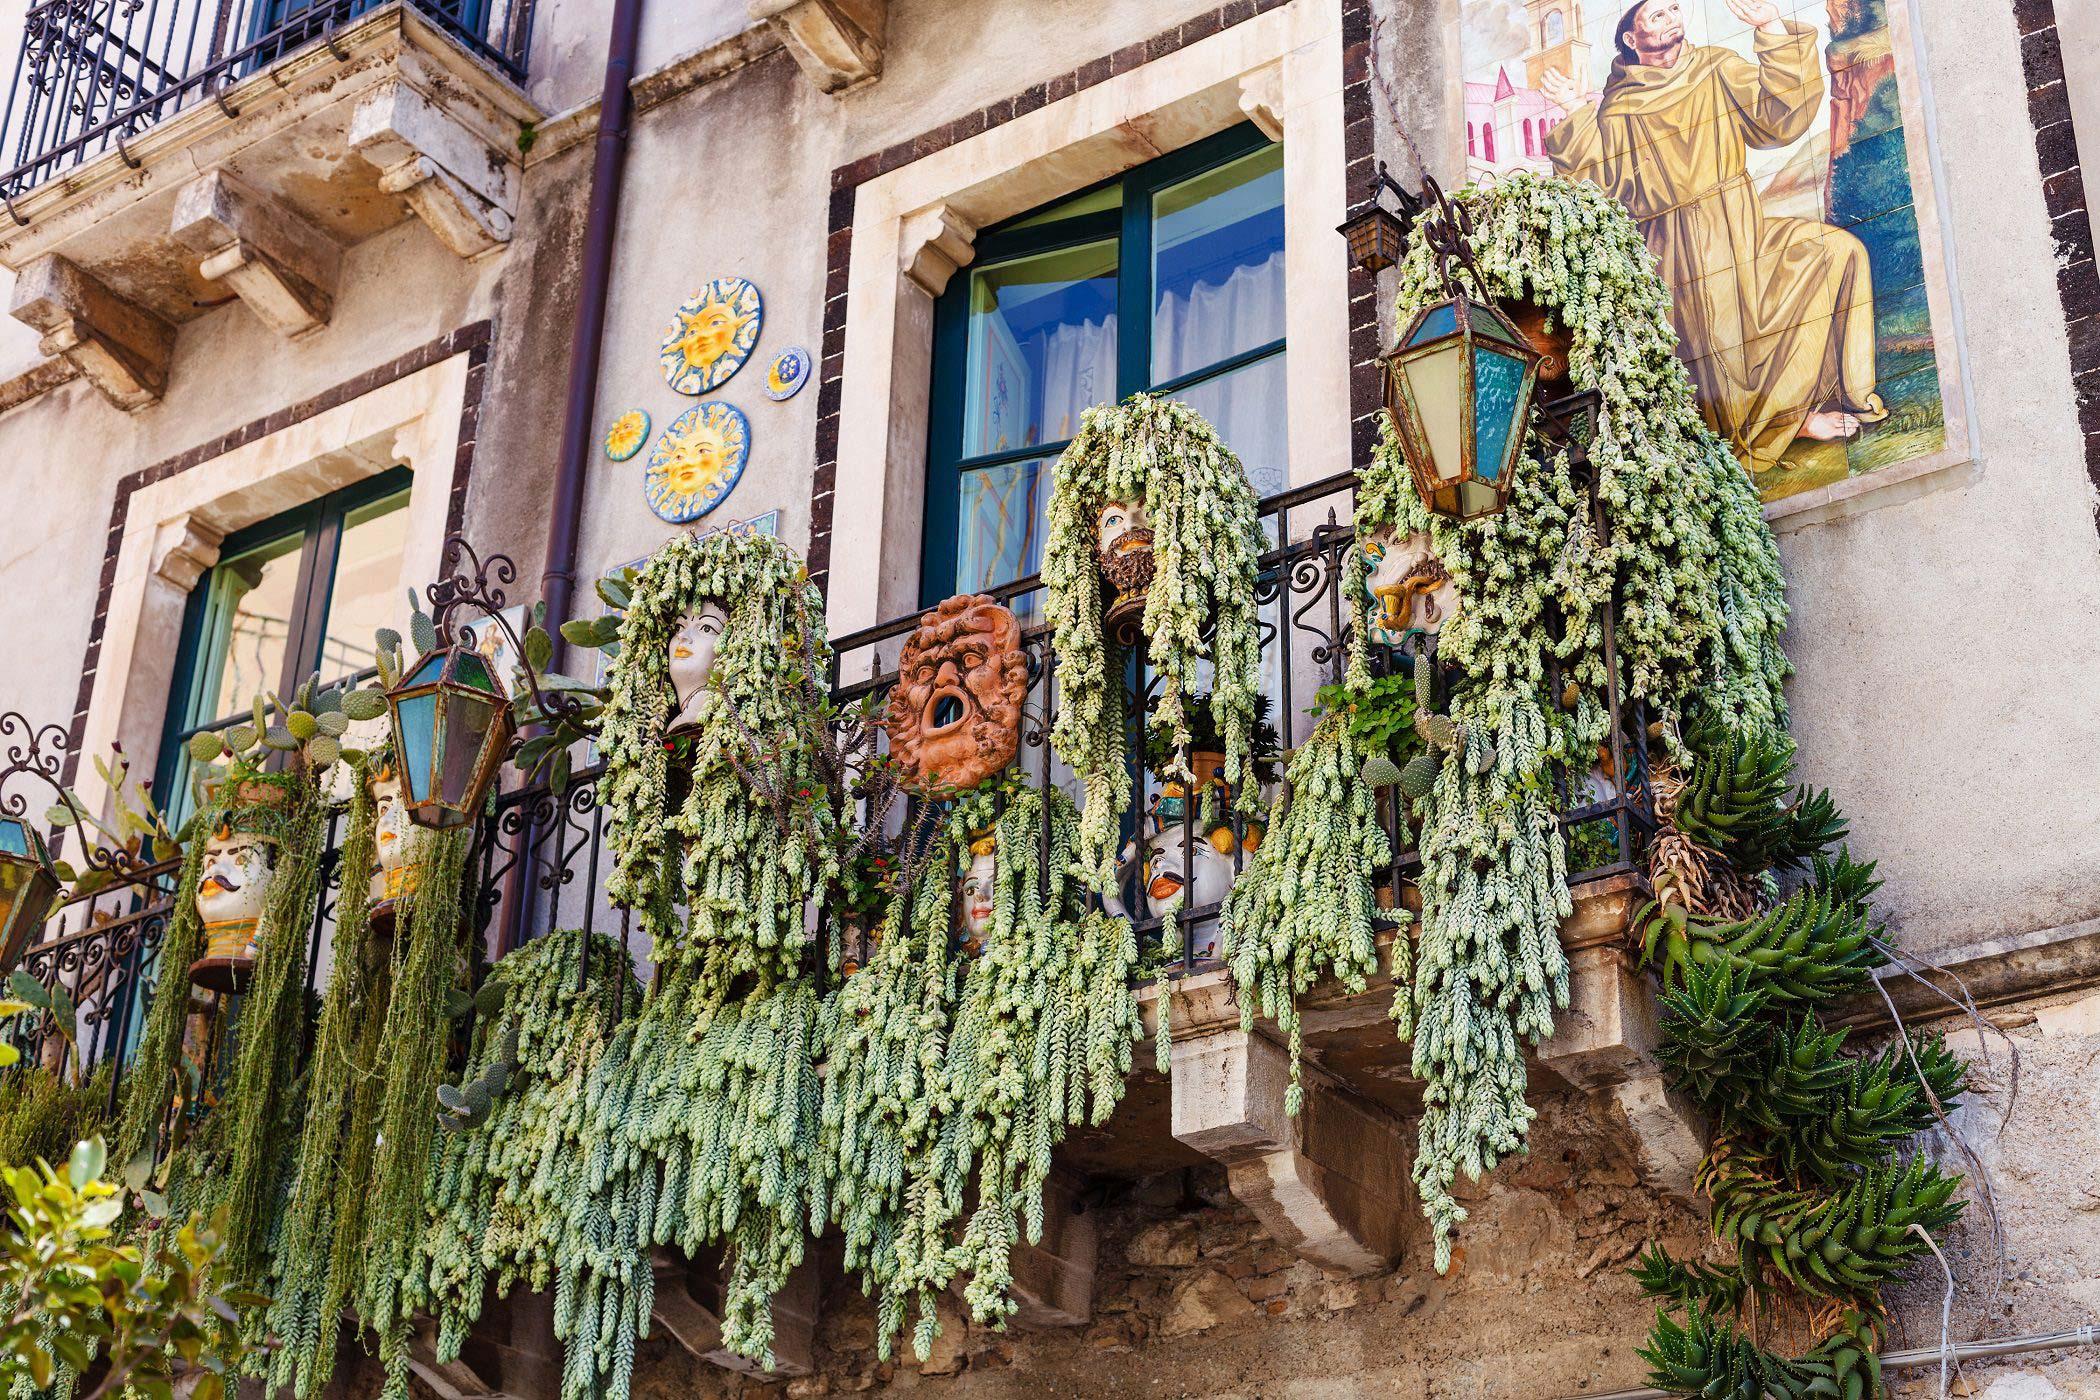 TAORMINA, ITALY - APRIL 3, 2015: traditional decoration on balcony of urban house in Taormina town, Sicily.